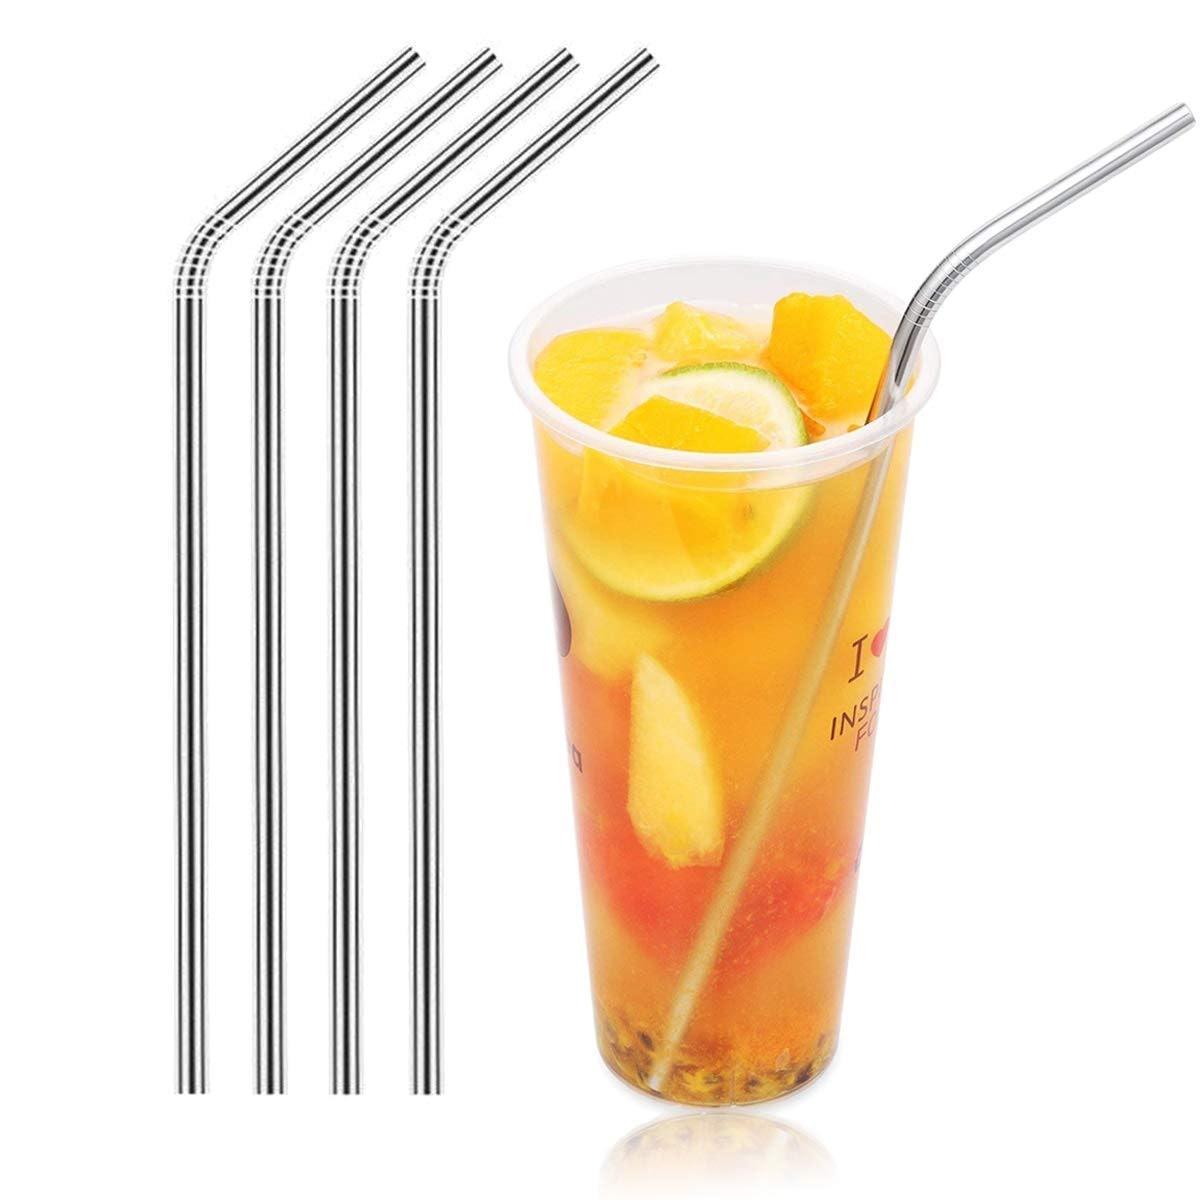 Magnum Steel Stainless Steel Drinking Straws (4 Pack)